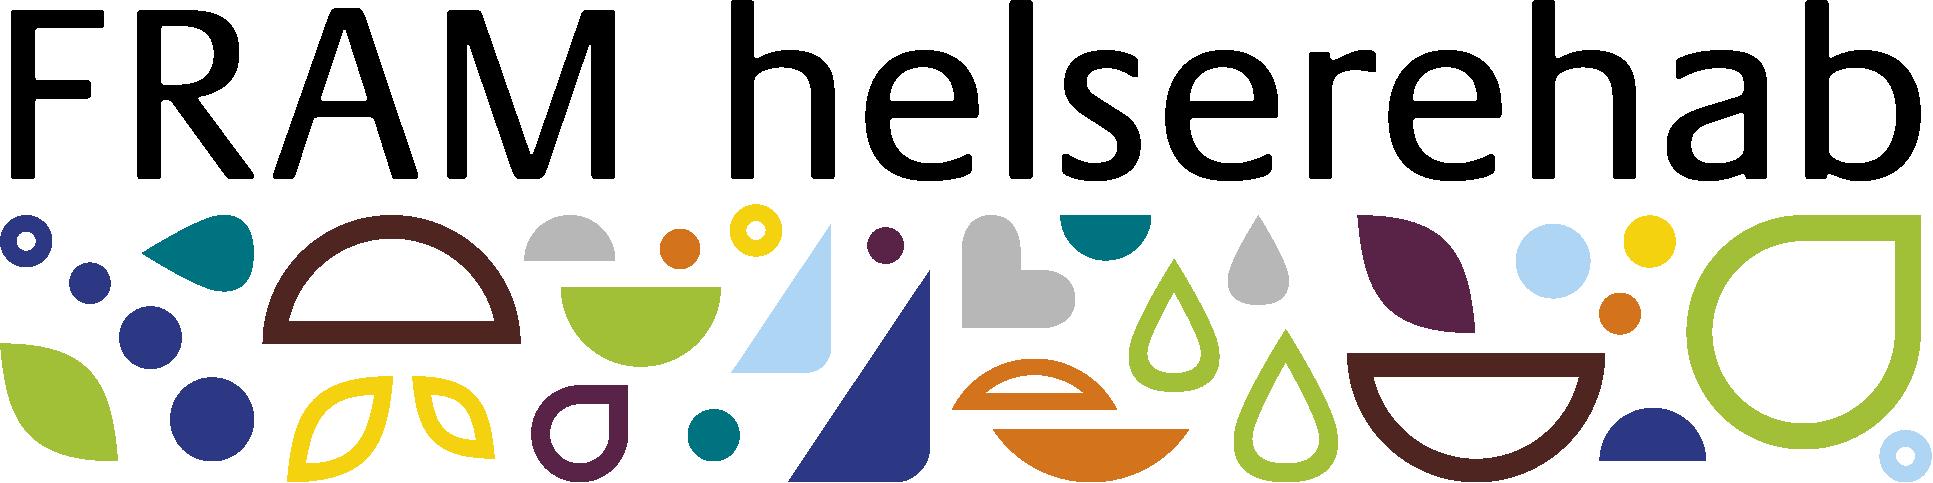 Fram Helserehab logo